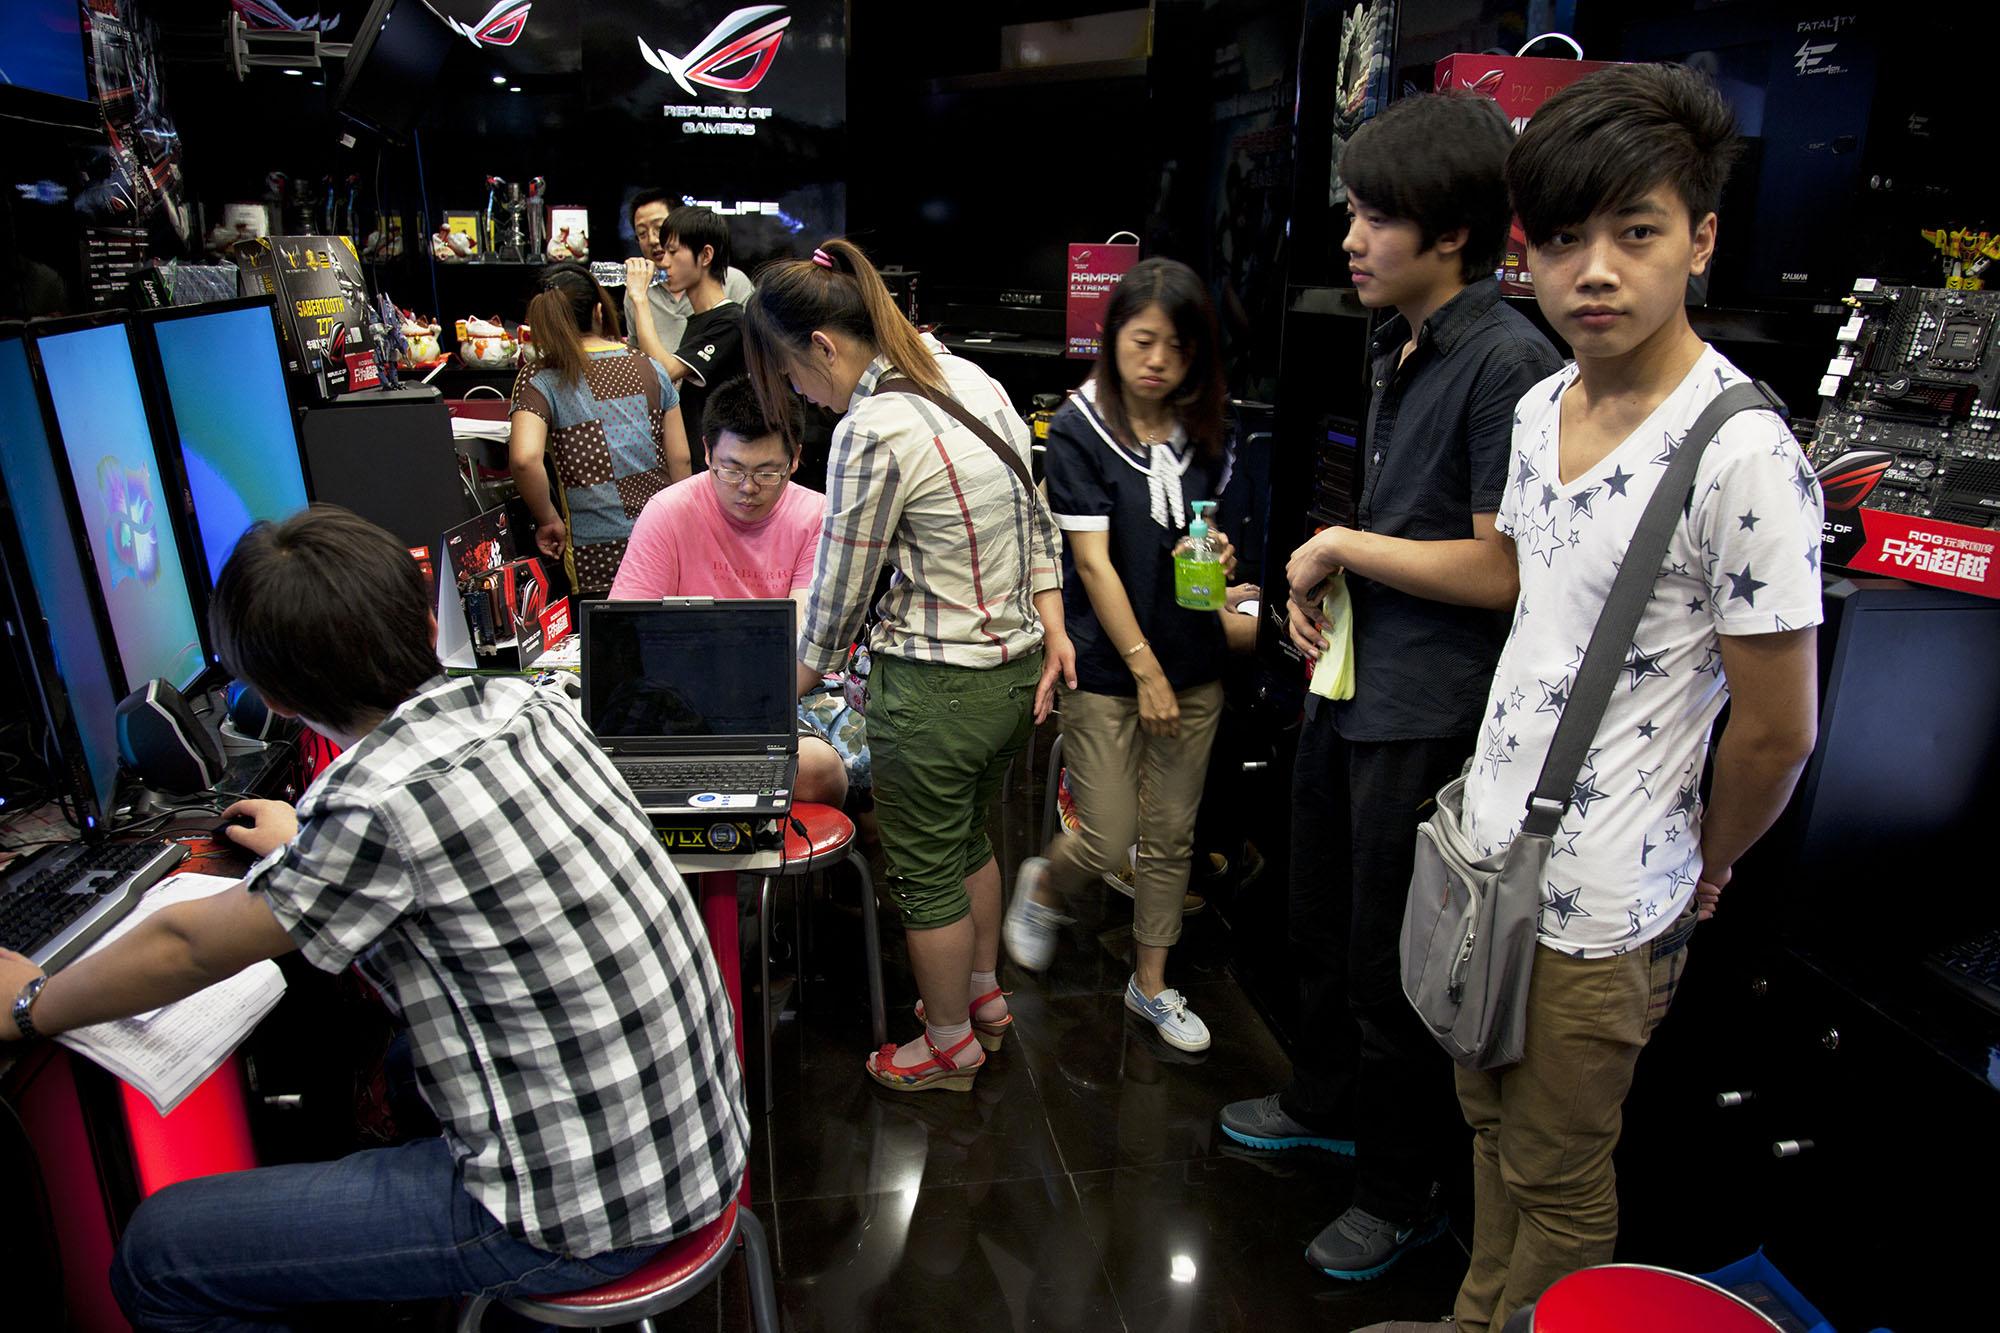 Computer game geeks inside e-plaza digital square shopping mall at Zhongguancun.